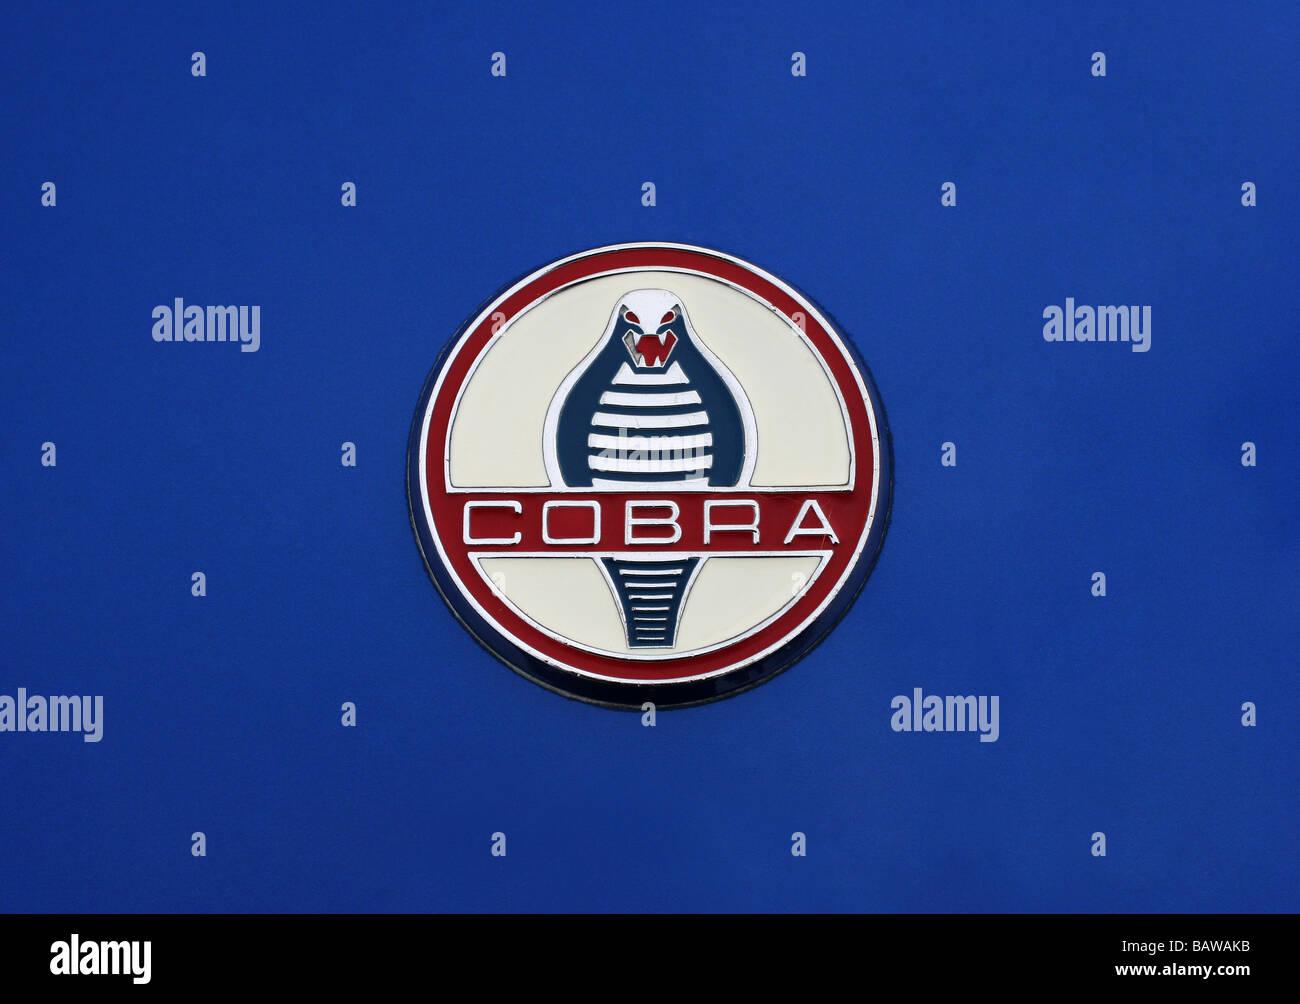 Cobra Kit Car Stockfotos & Cobra Kit Car Bilder - Alamy